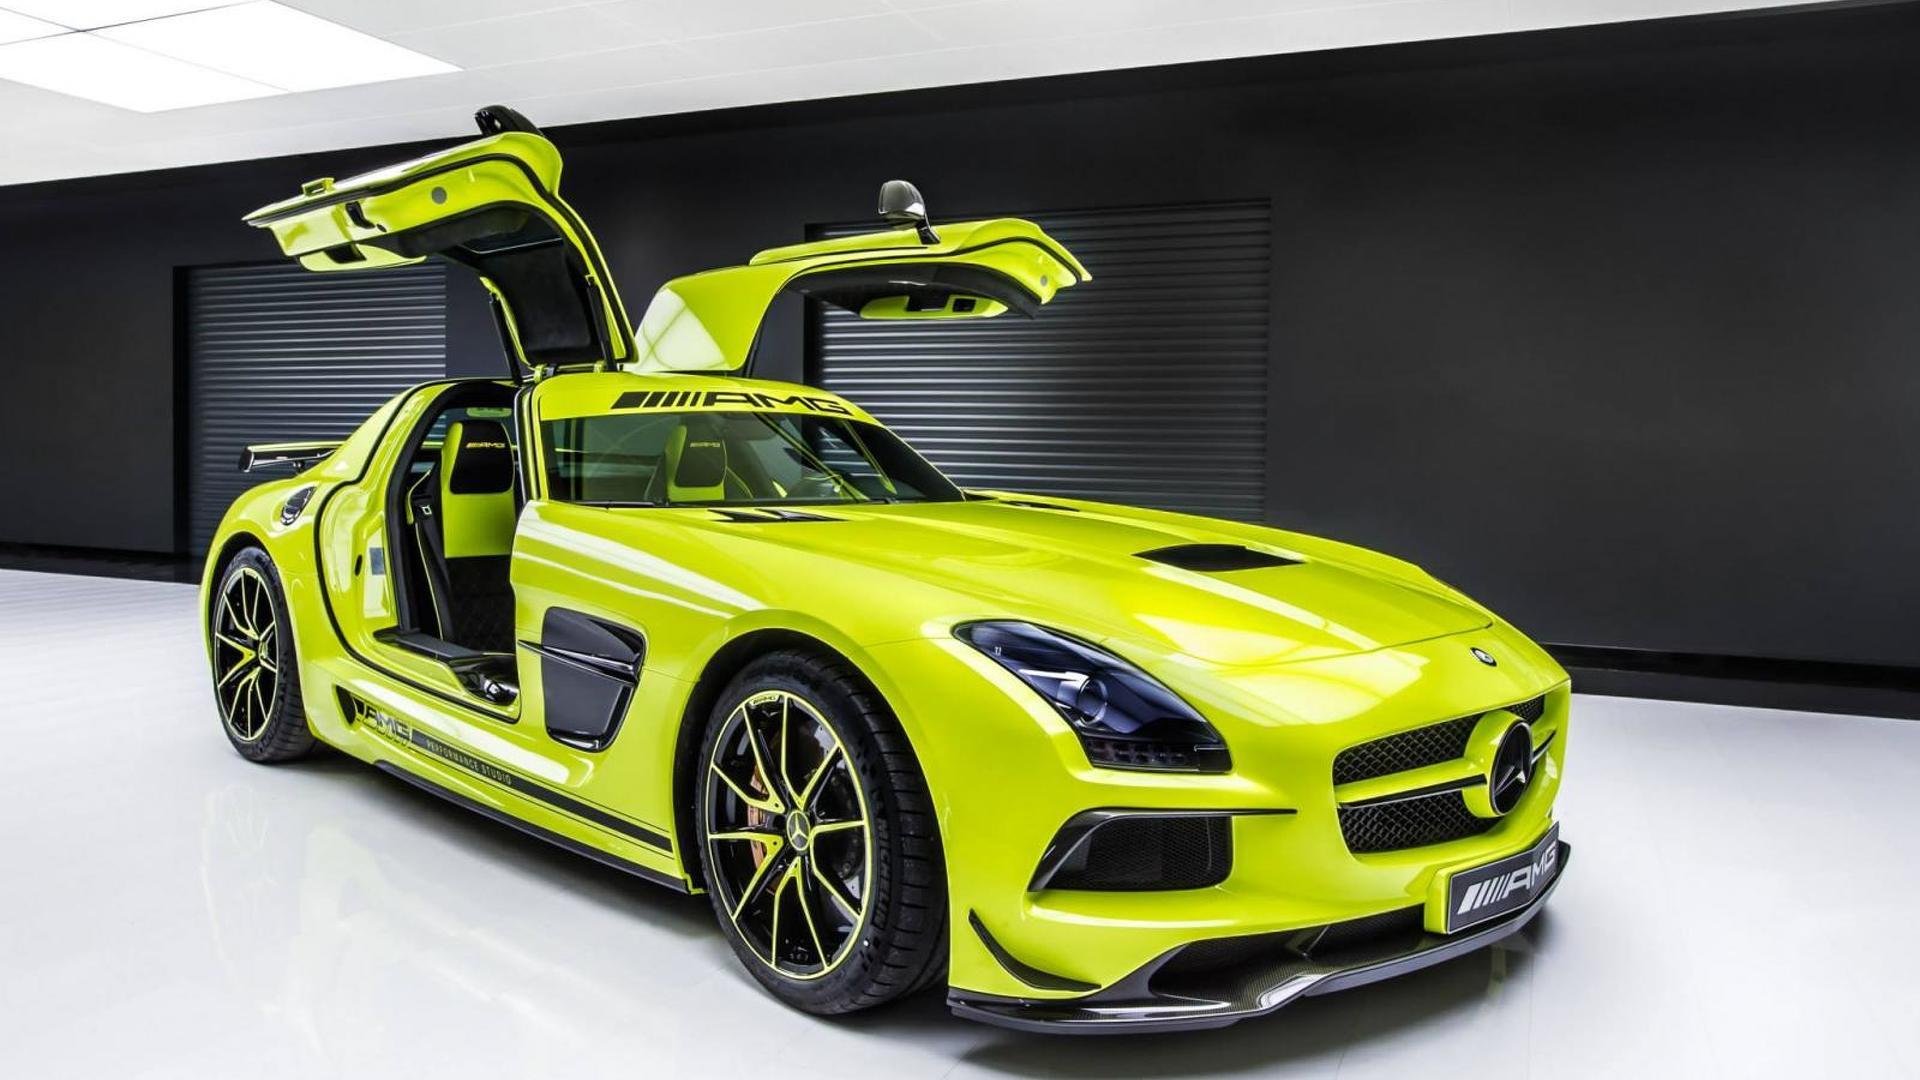 Mercedes SLS AMG Black Series Gets The Bespoke Treatment By Performance Studio